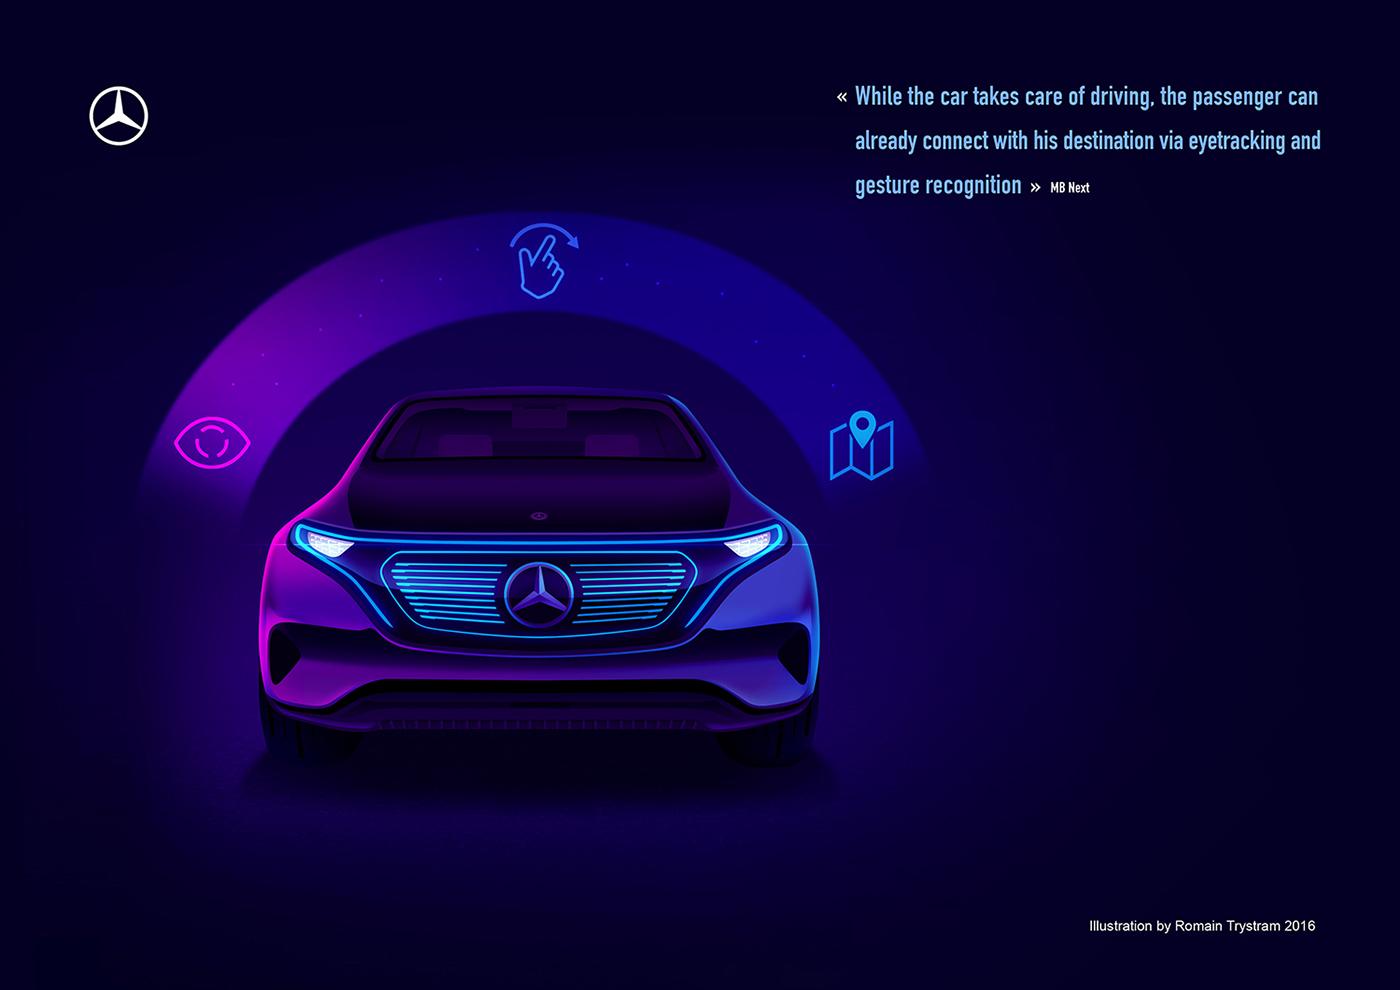 mercedes connected Data Technology futur IoT car trystram neon skyline